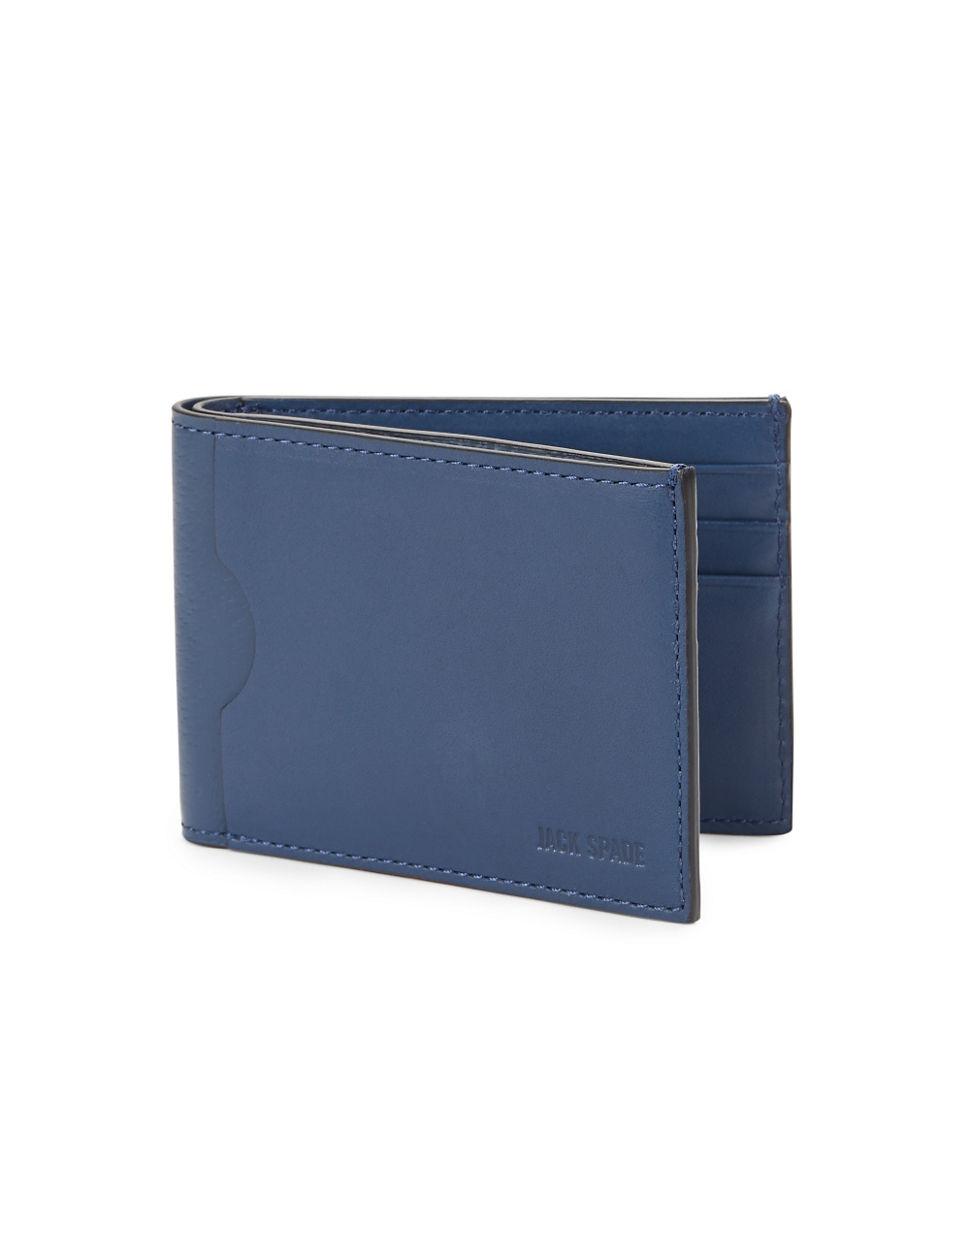 Jack Spade Leather Bifold Wallet In Blue For Men Lyst